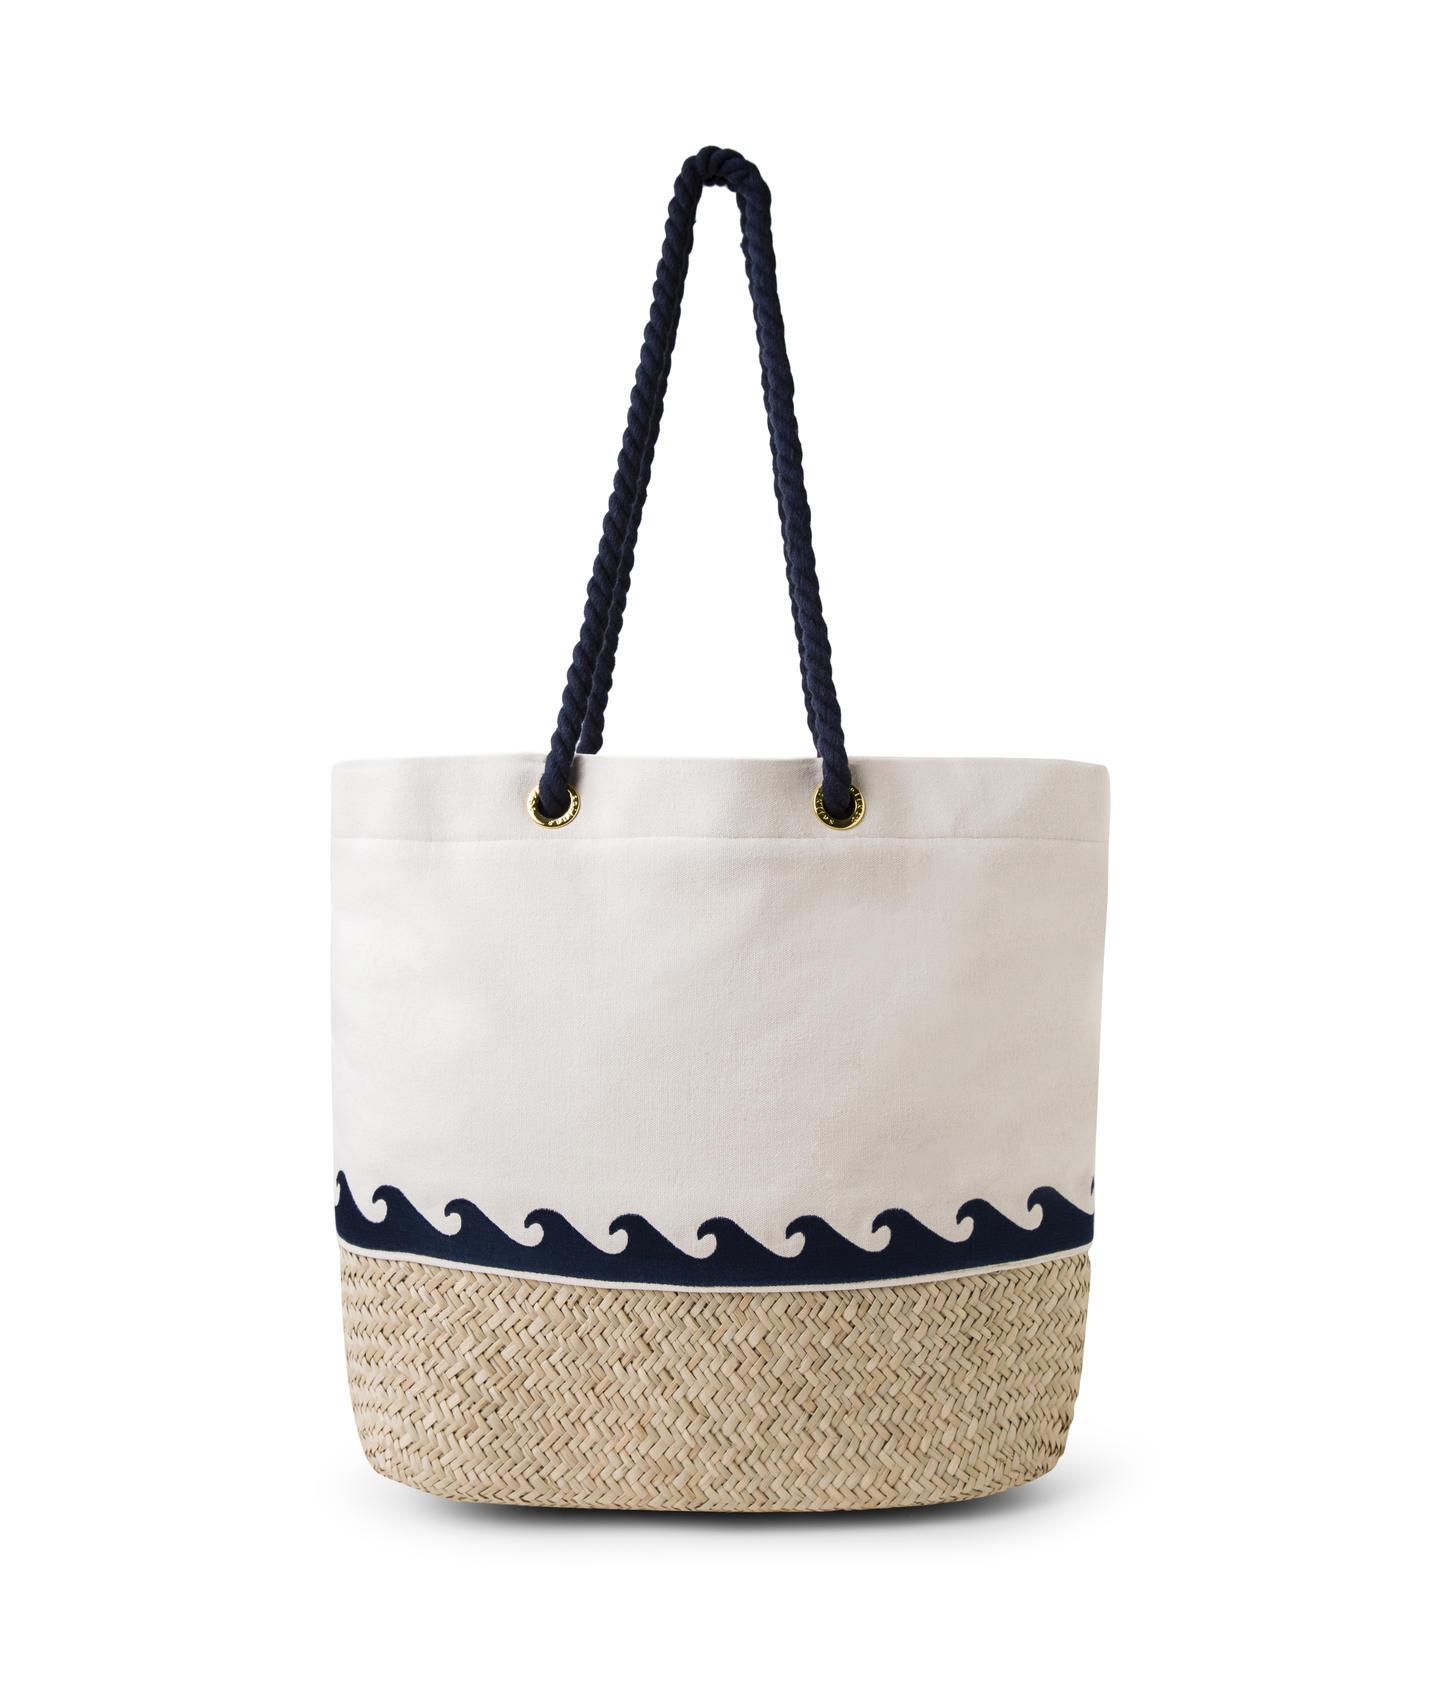 c126cadc48c9ca Beach bag made of canvas and braided straw - BOLSA LONA PALHA ...